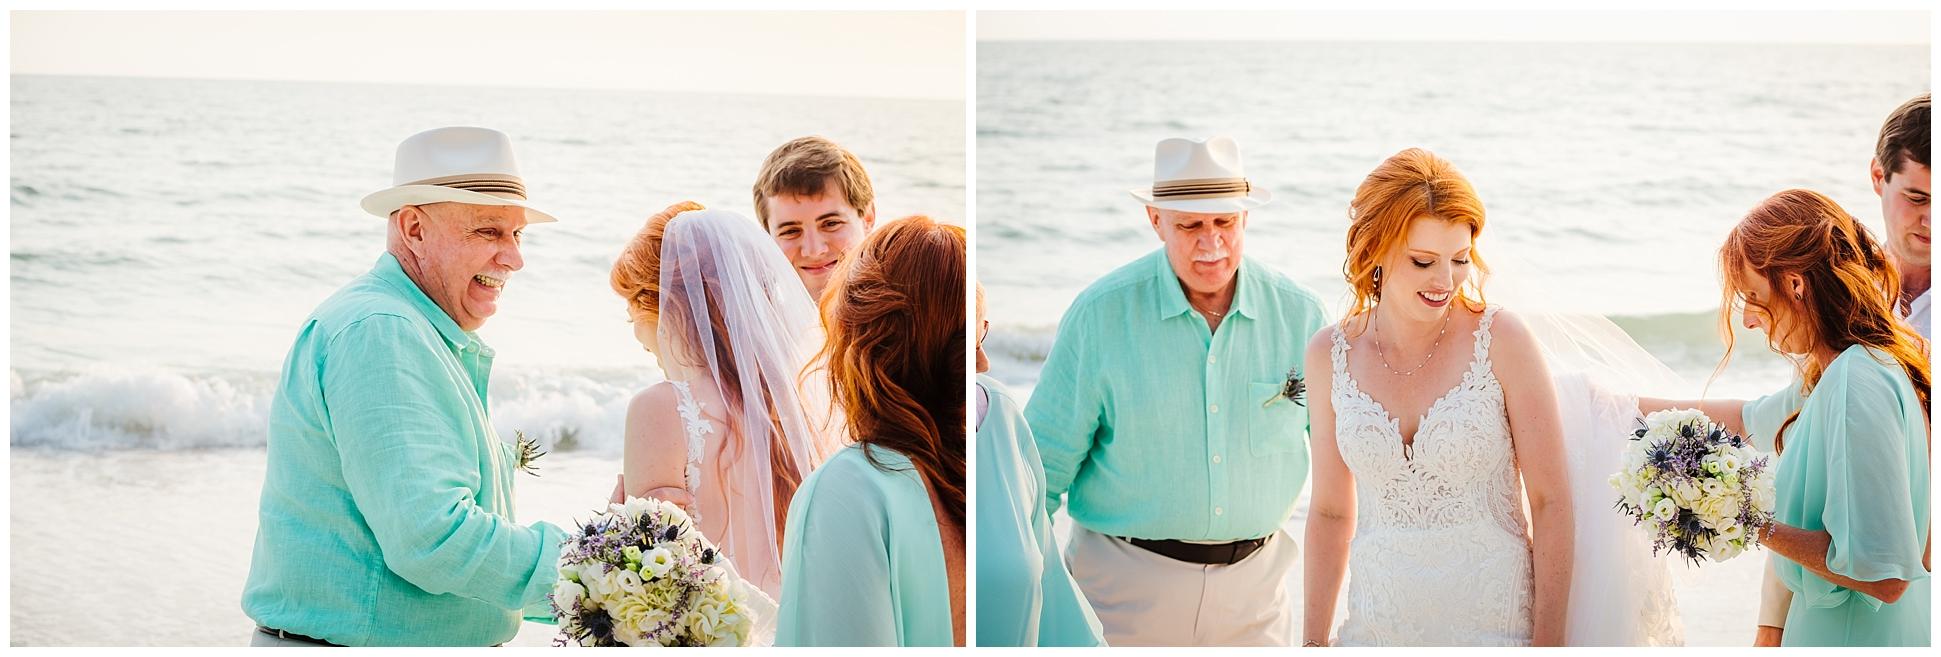 tampa-st-pete-wedding-photographer-indian-rocks-beach-mermaid-train-redhead_0144.jpg